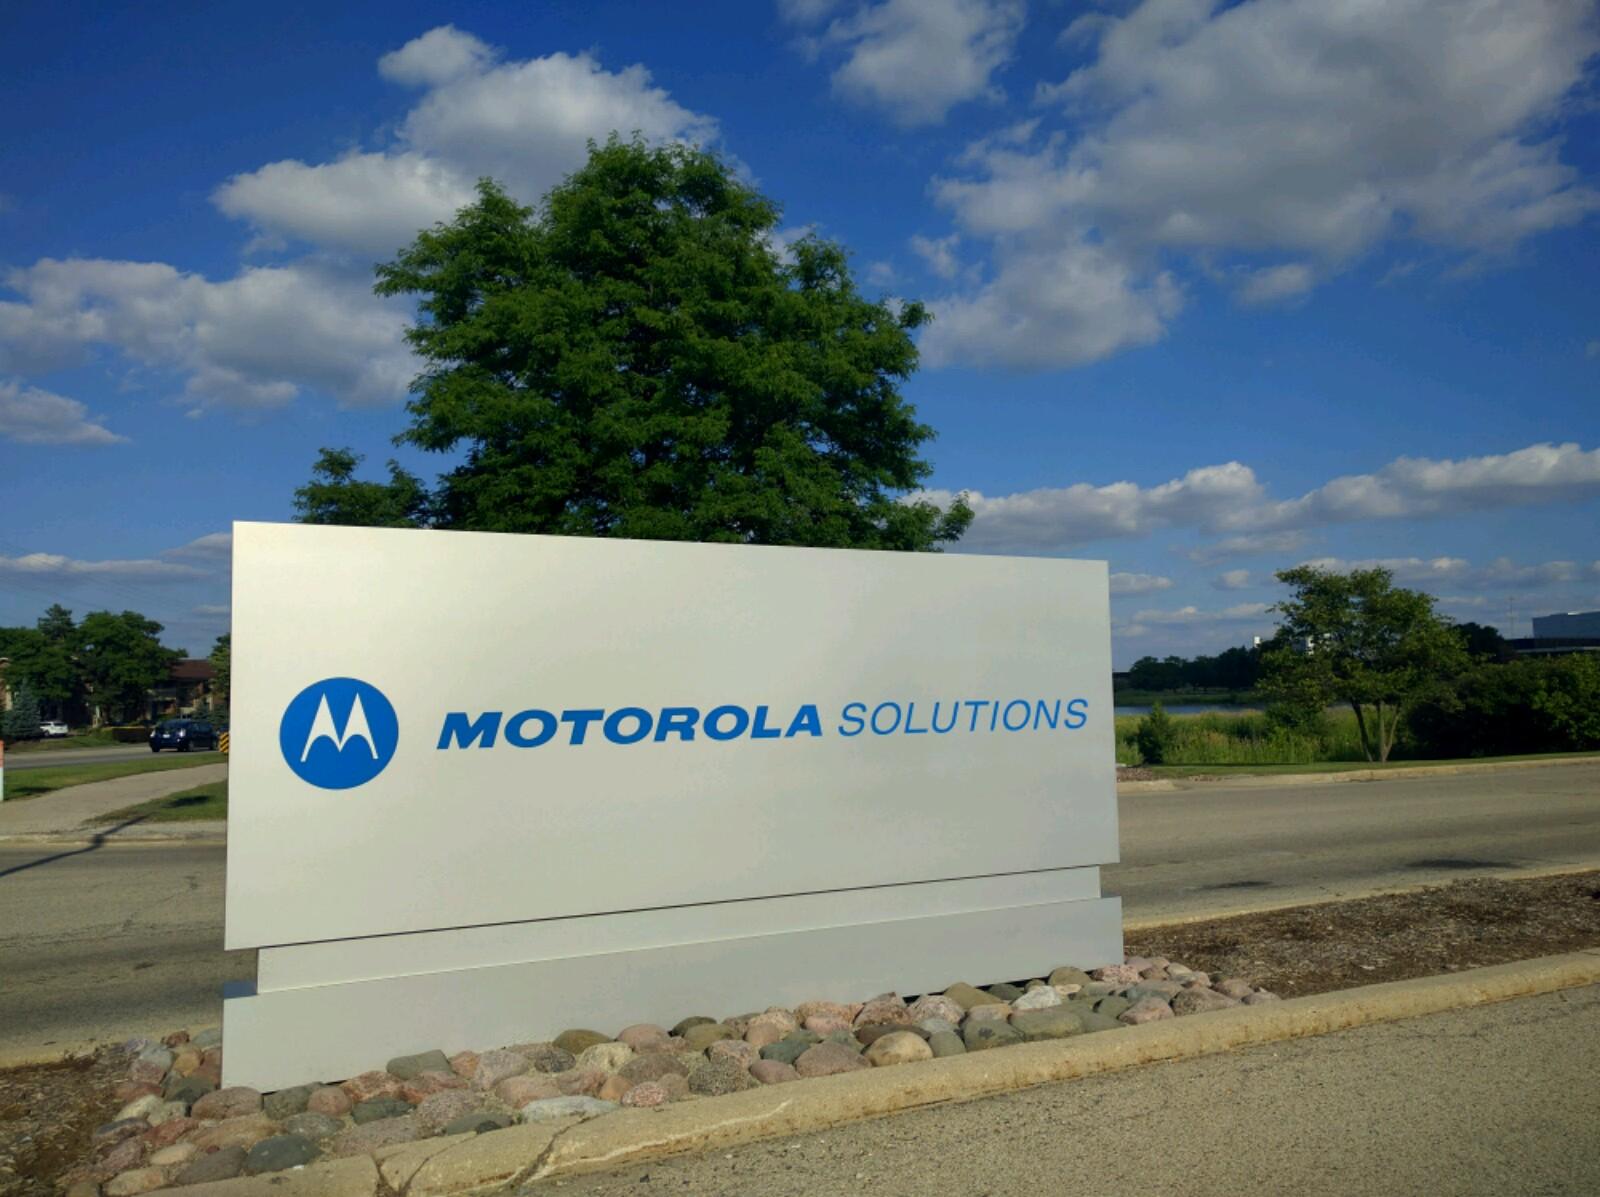 Entrance to Motorola Solutions' corporate campus in Schaumburg, Illinois.